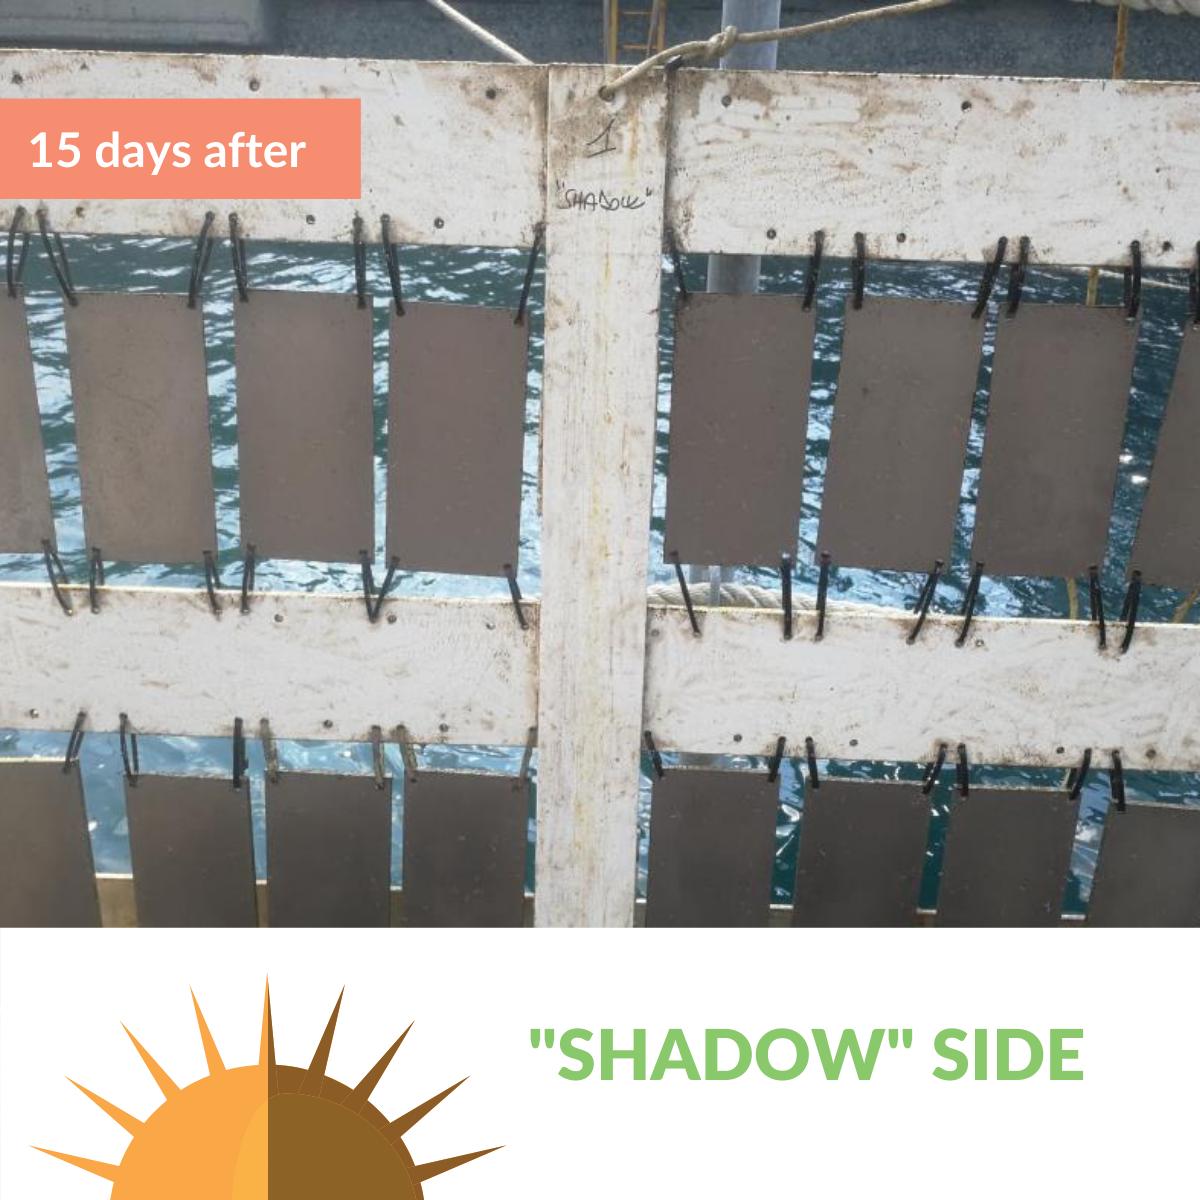 micoatec_rack après immersion_3_shadow